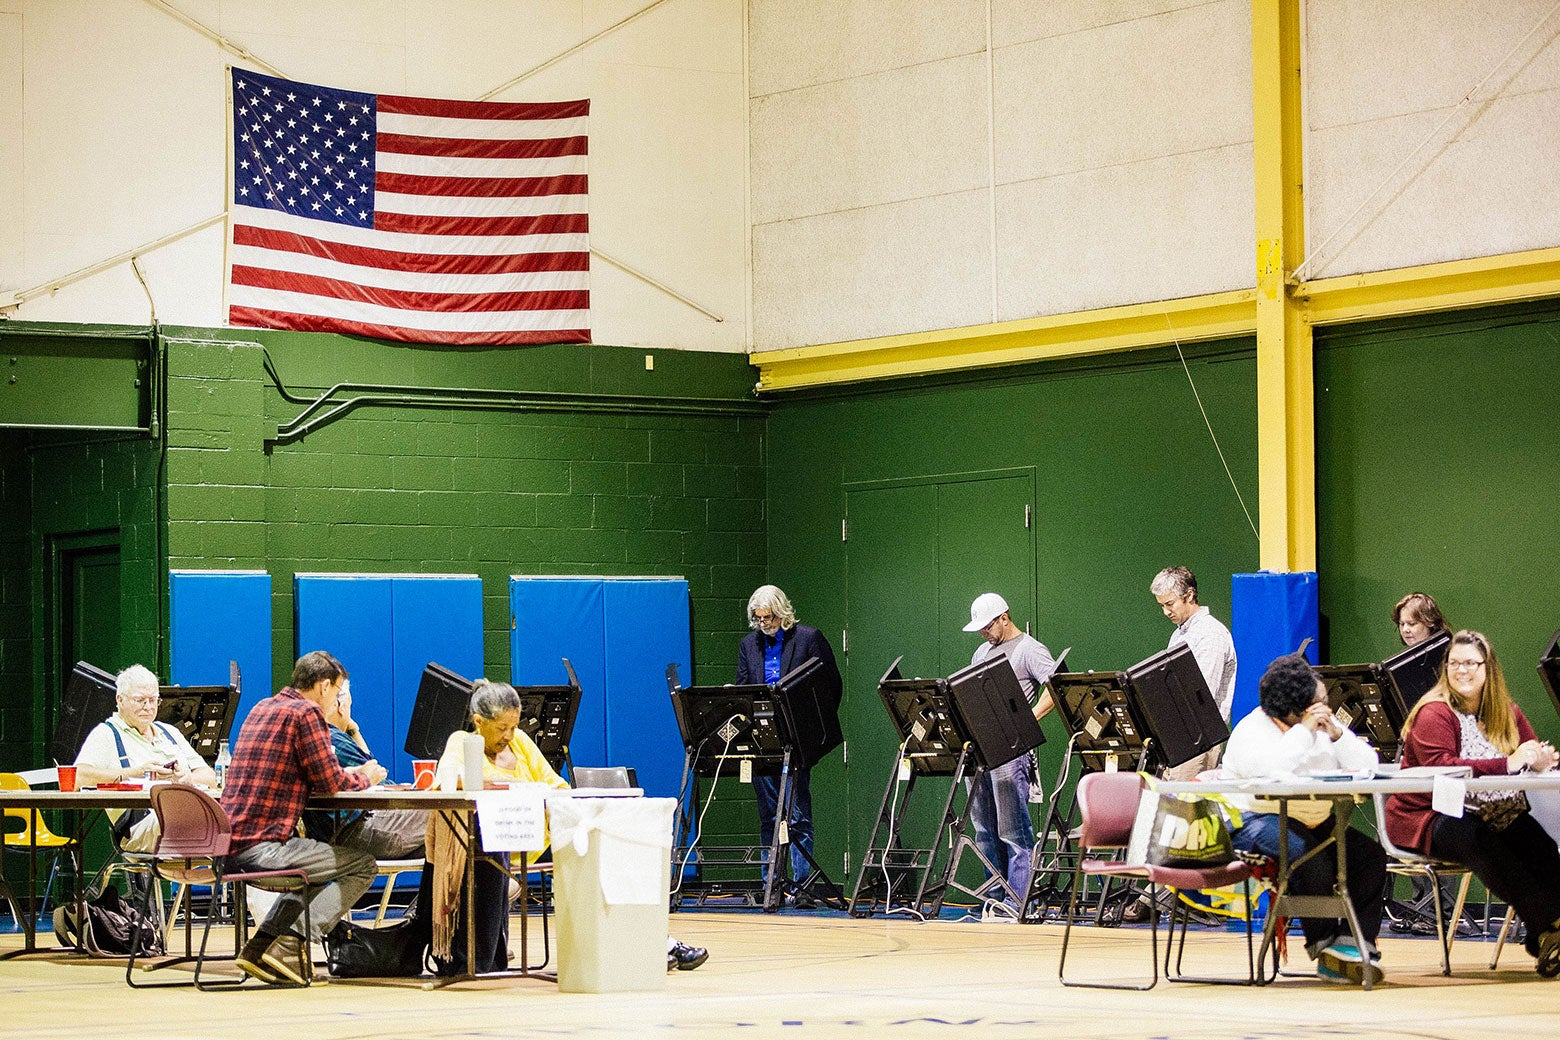 Voters cast their ballots near uptown Charlotte, North Carolina, on Nov. 8, 2016.